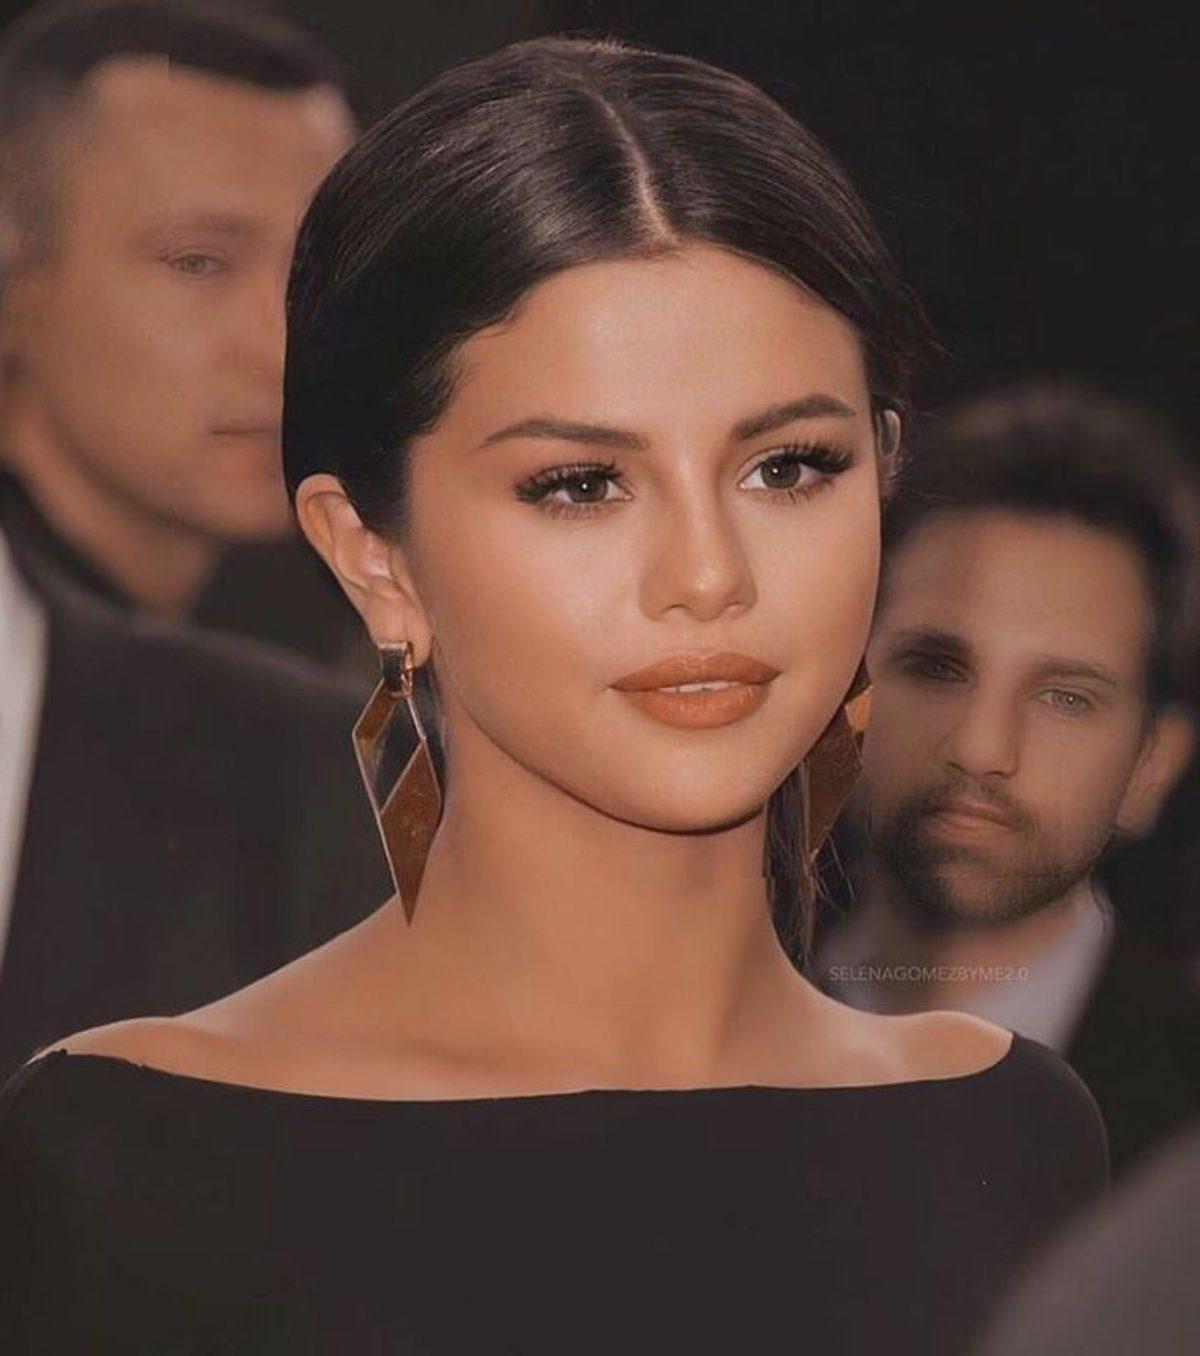 Dated who selena gomez who Selena Gomez